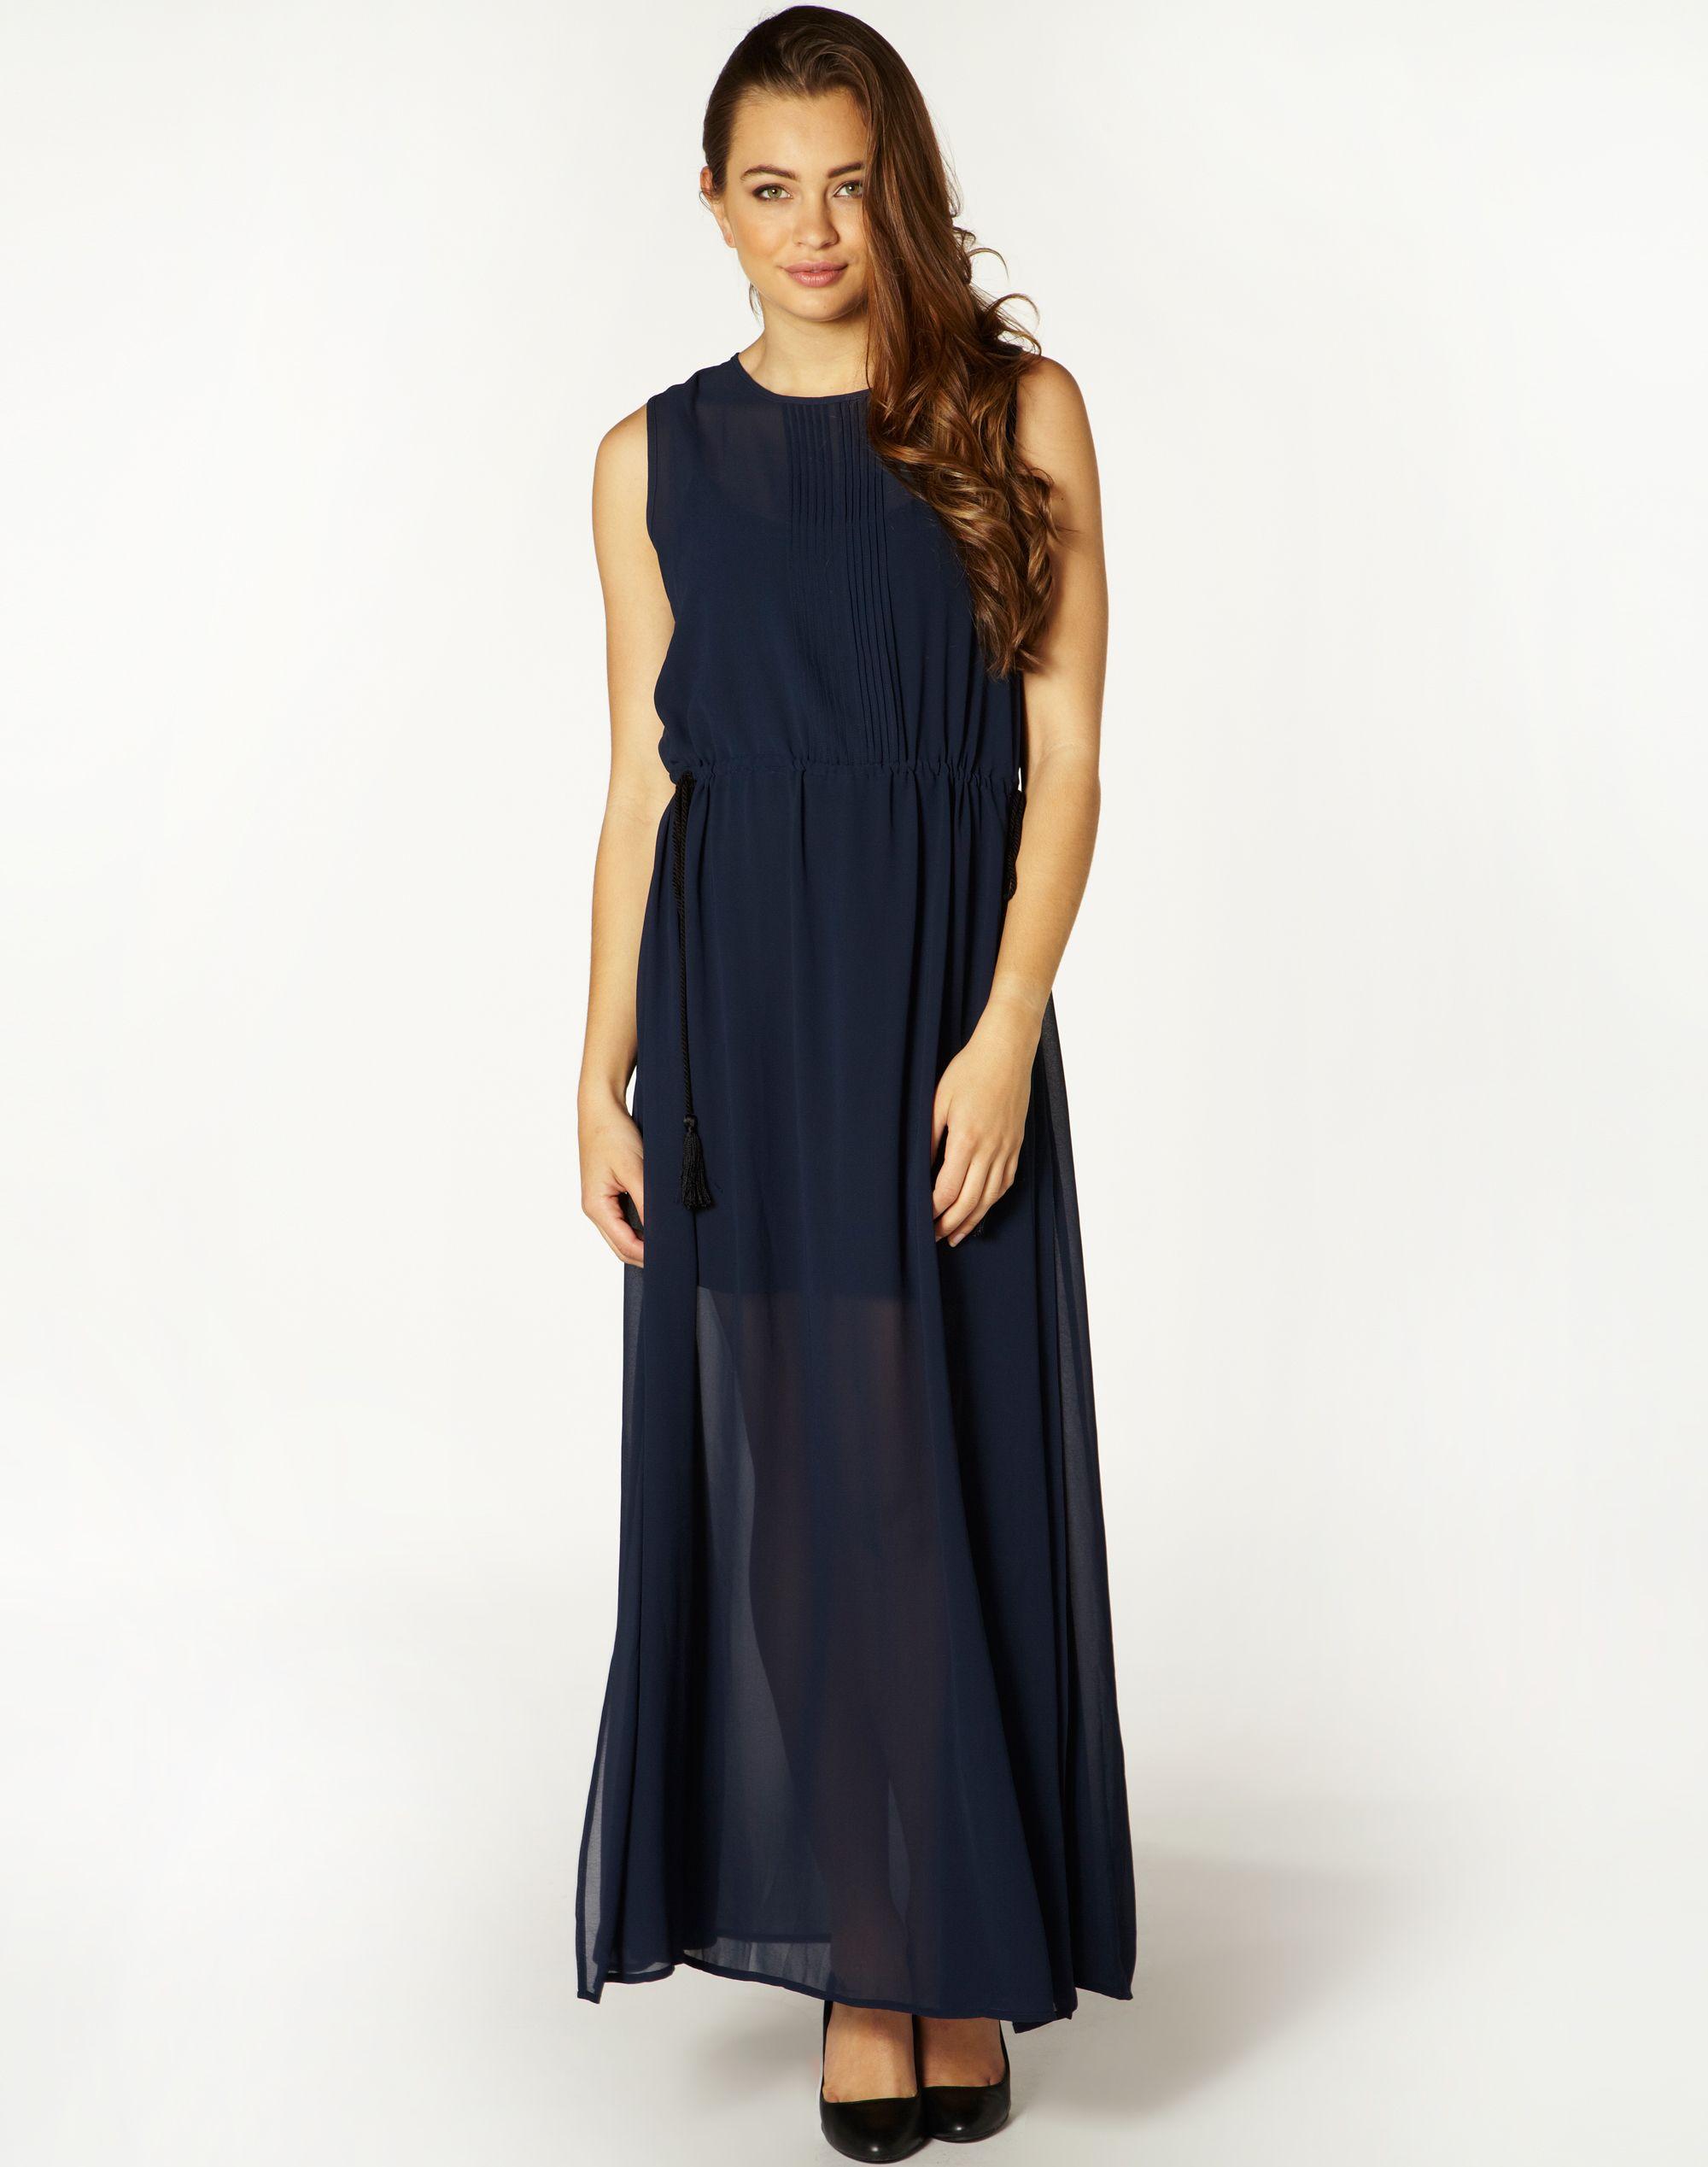 Sheer Pin Tuck Maxi Dress at Westfield Doncaster   Dresses